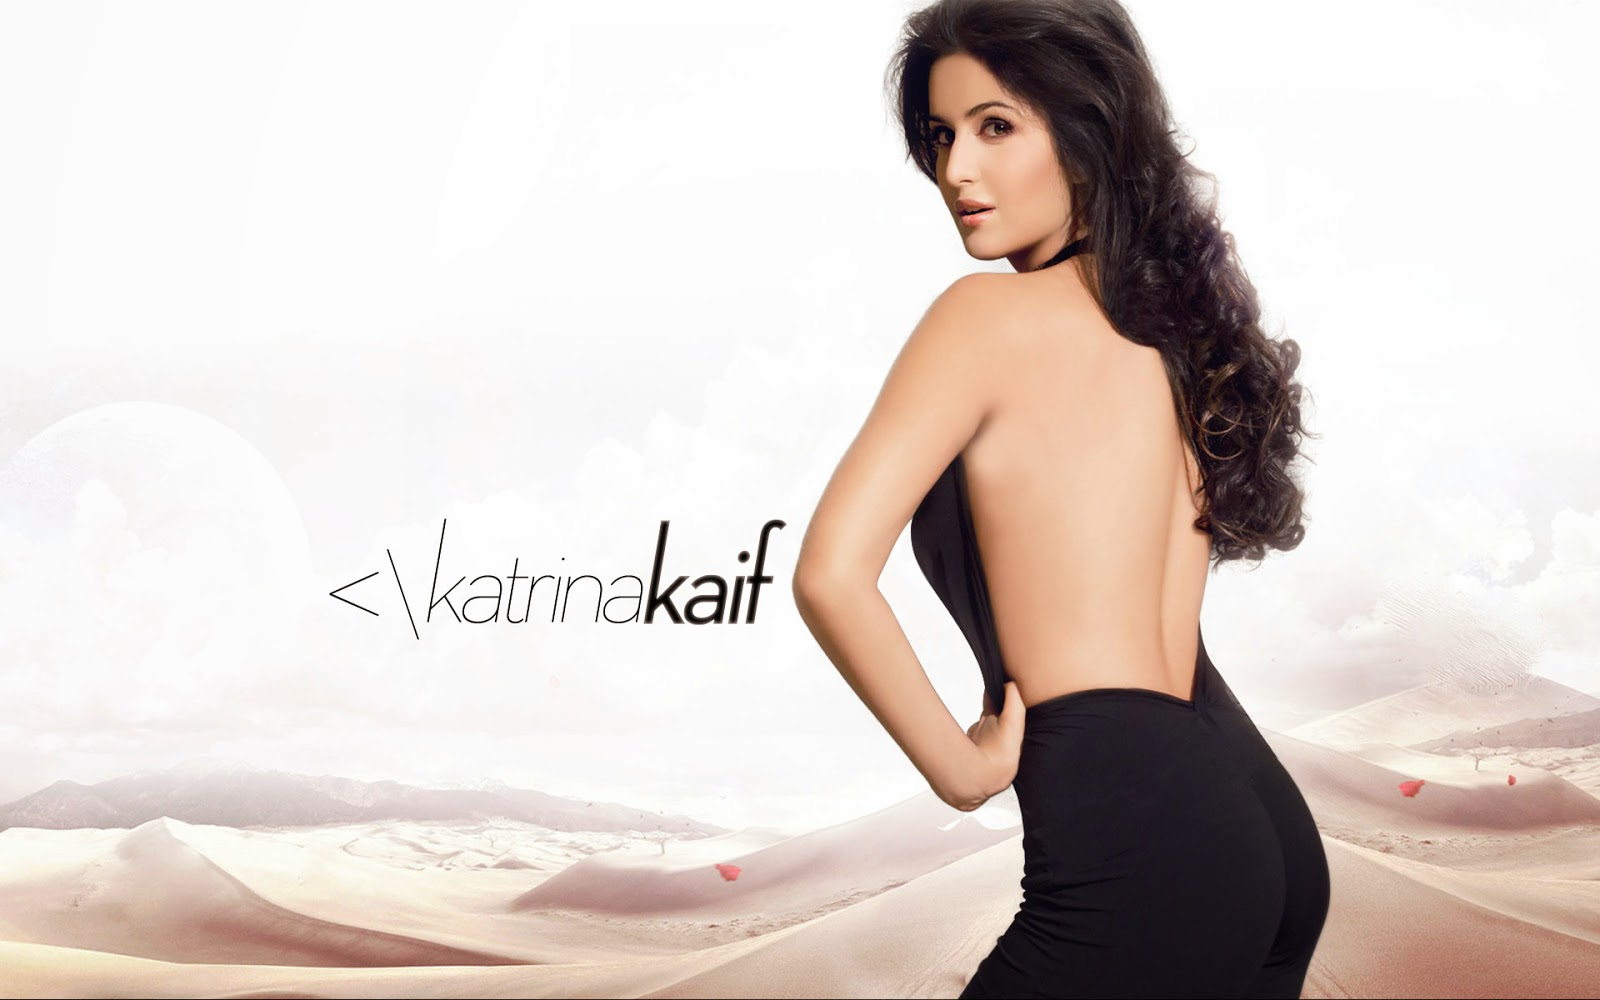 Katrina kaif latest hd desktop wallpaper 2014 15 world for Hot wallpapers world